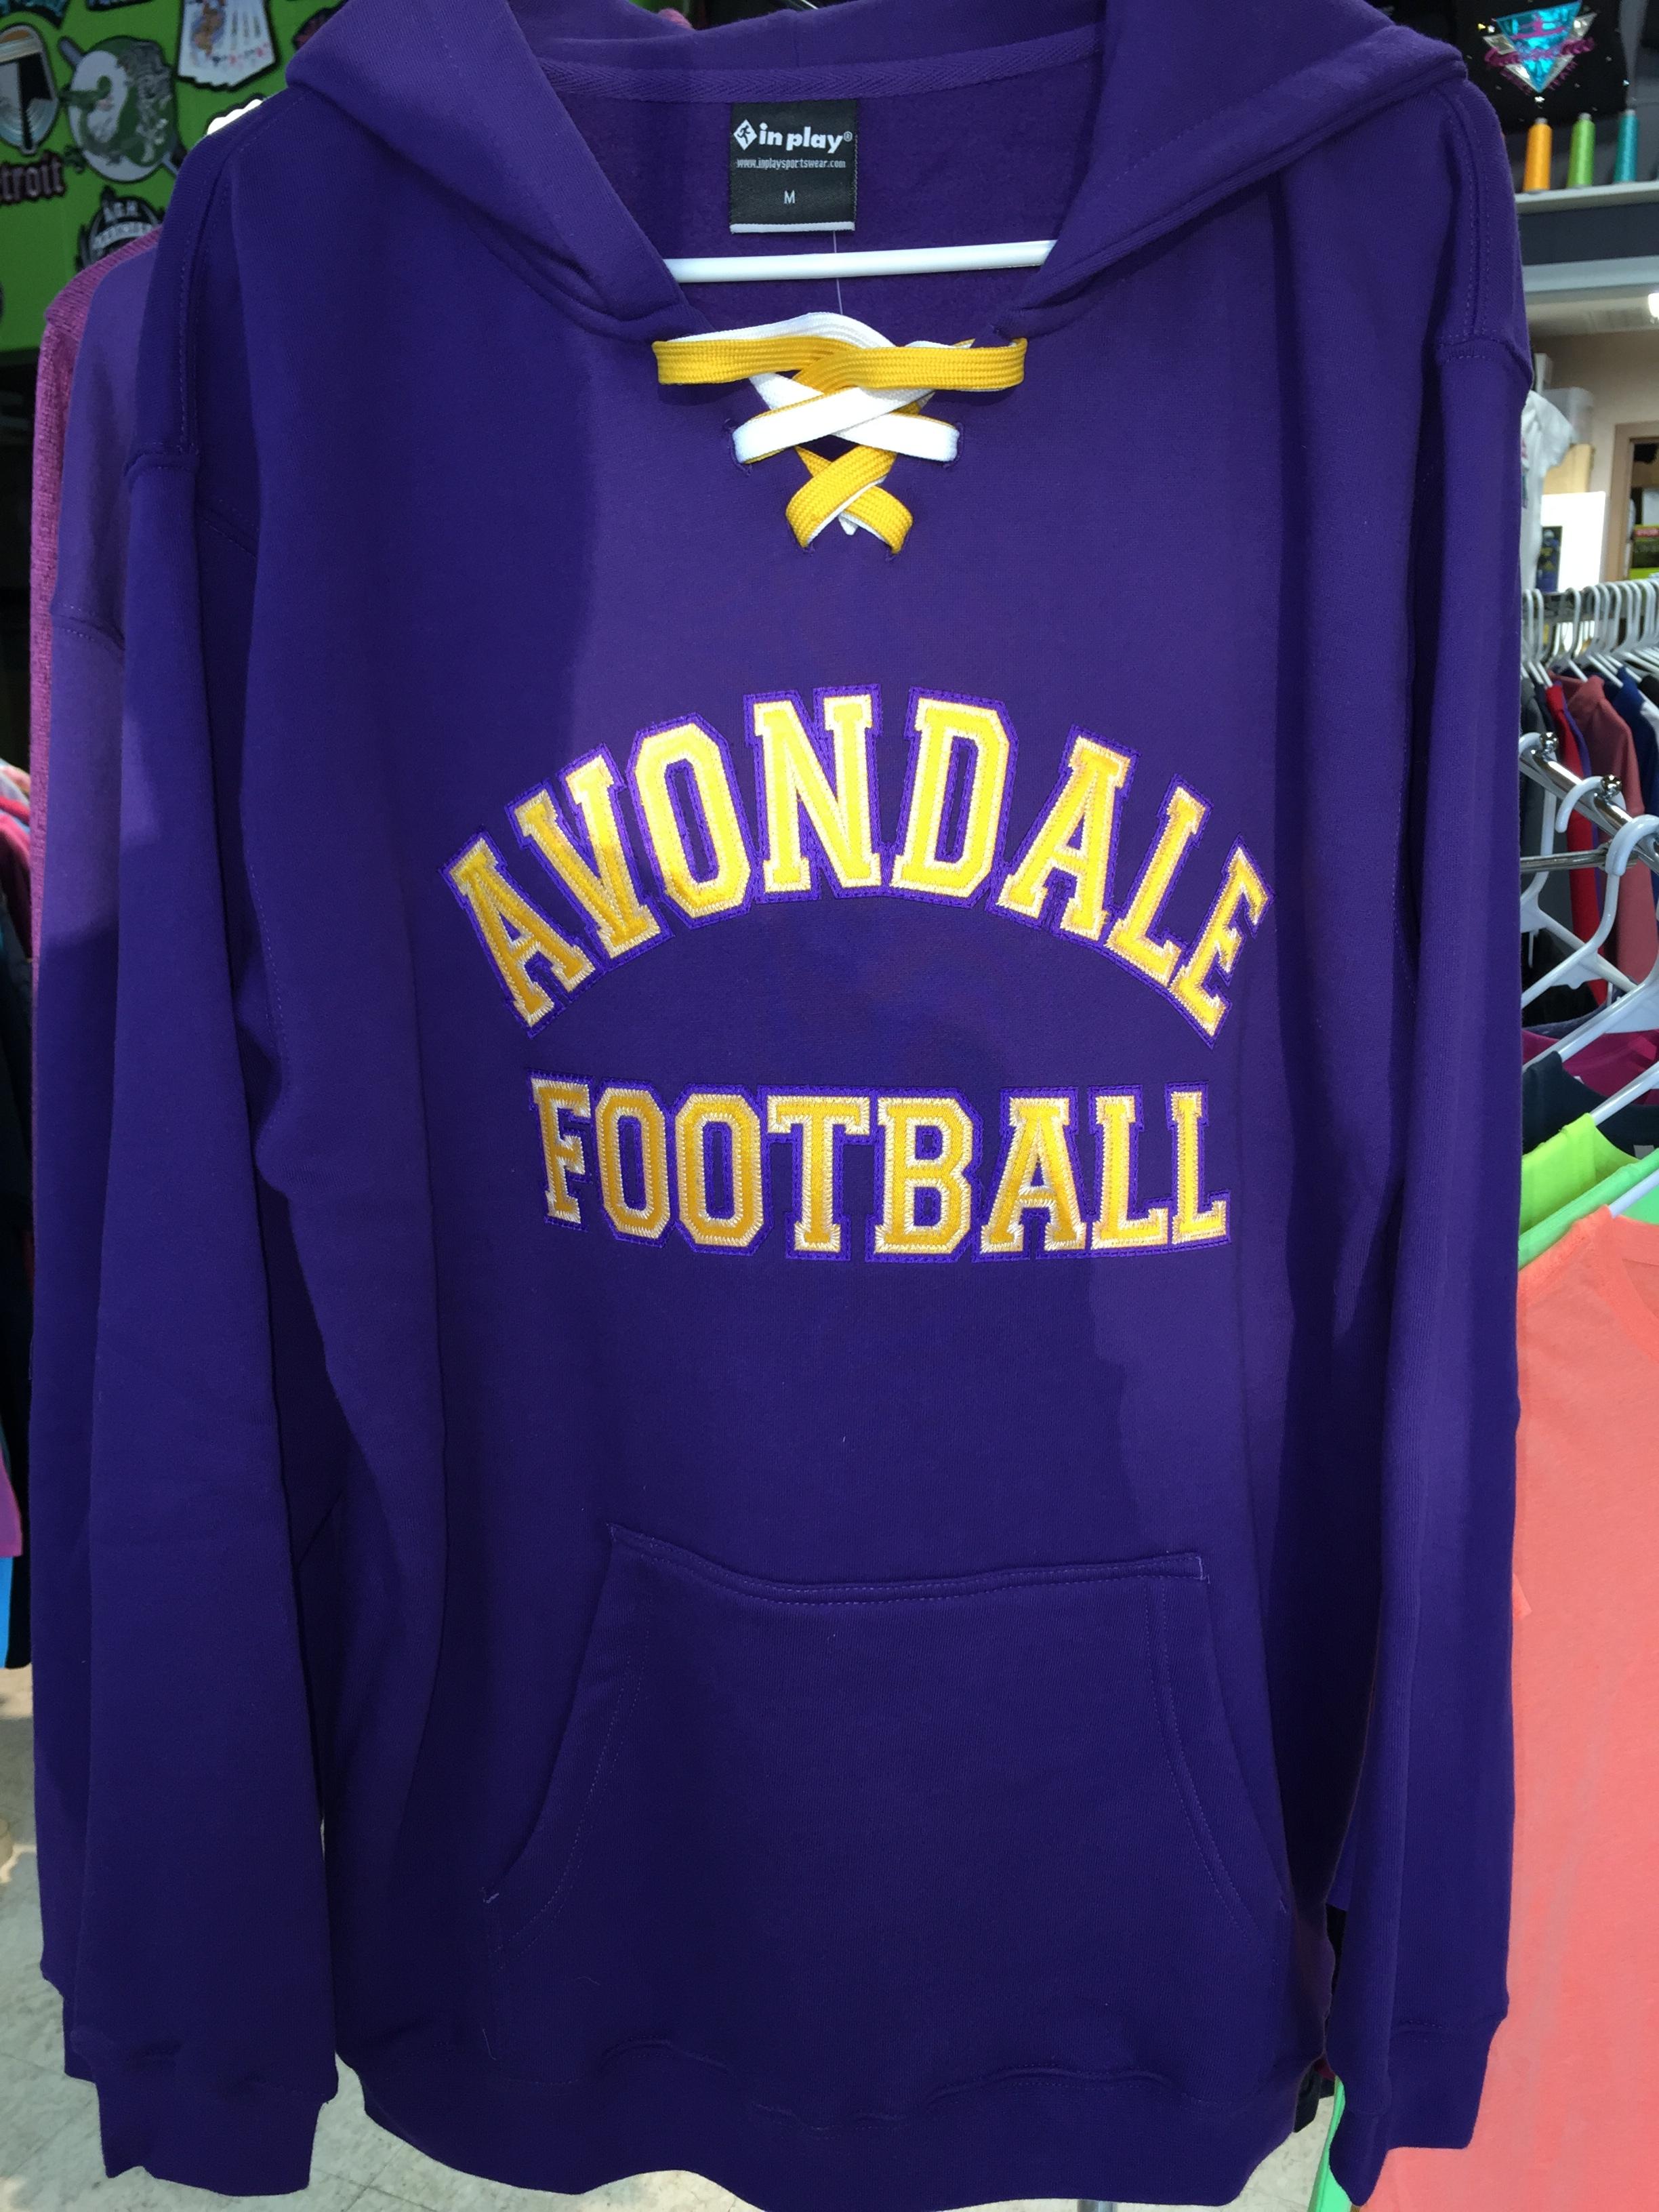 AvondaleFootball.JPG